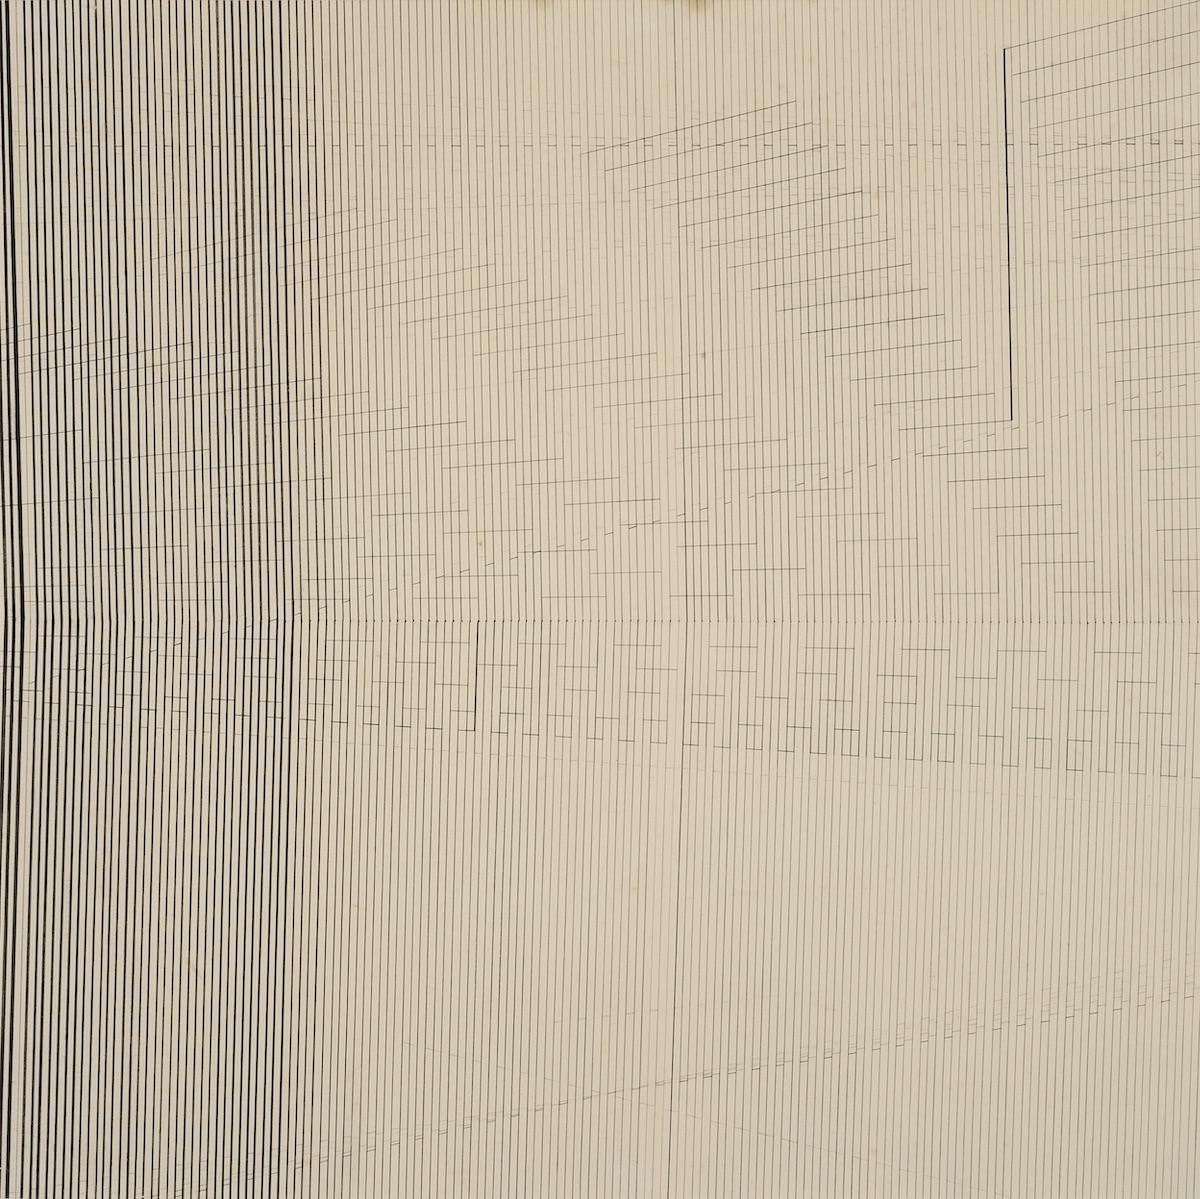 Nasreen Mohamedi, 'Untitled', ca. 1970s.